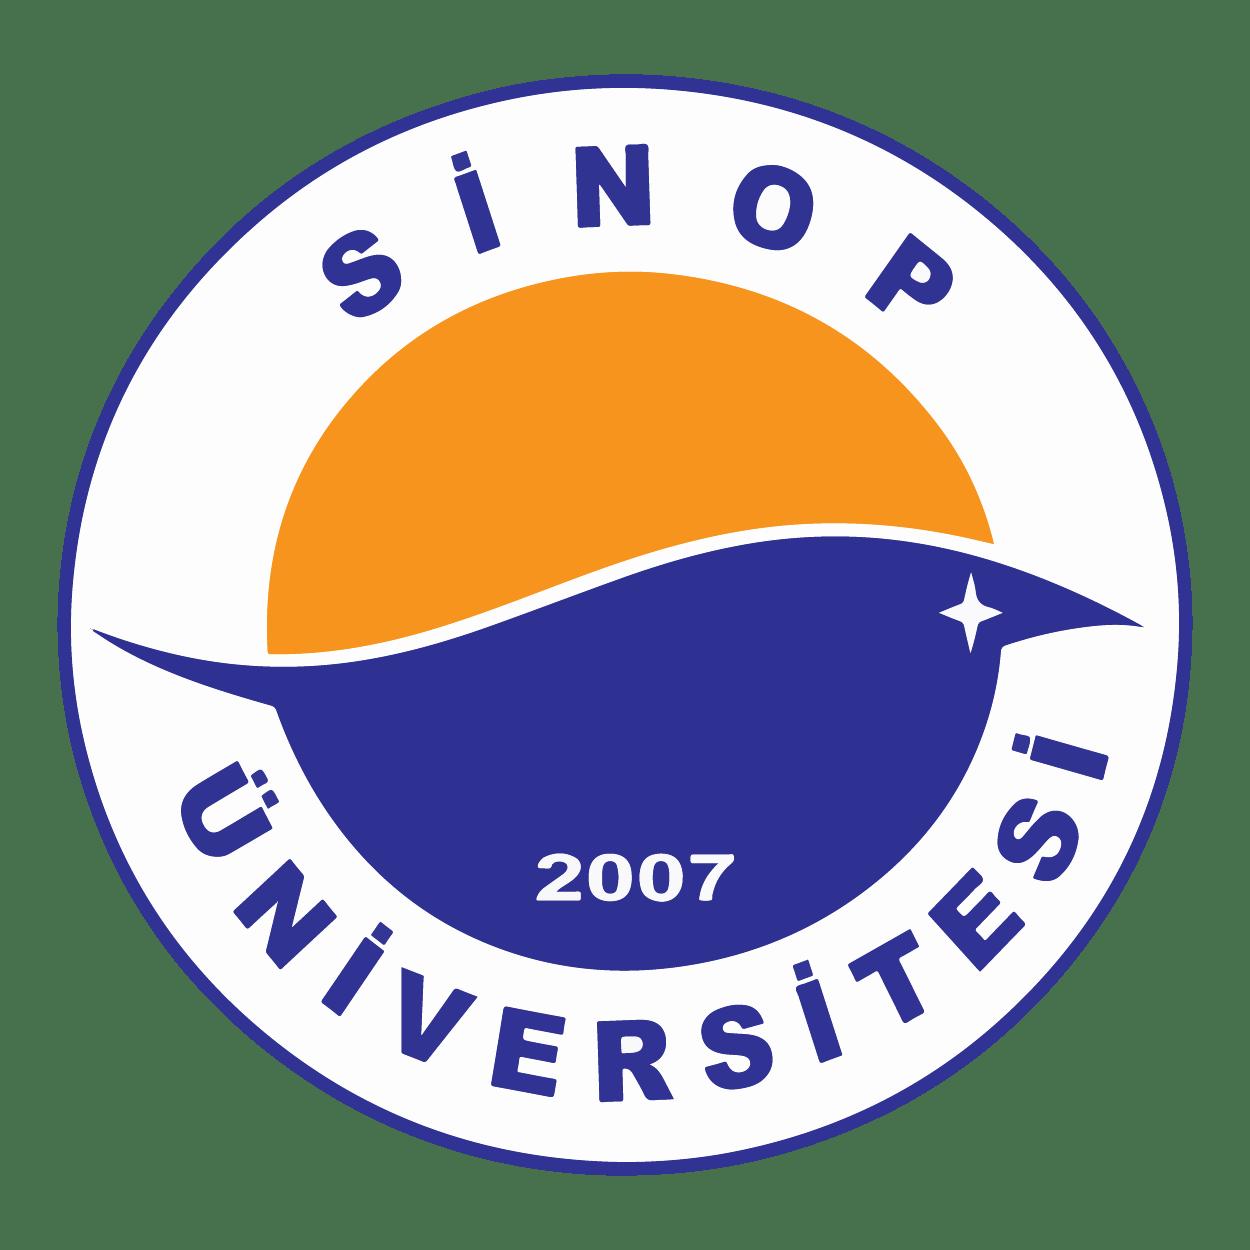 Sinop Üniversitesi Logo png